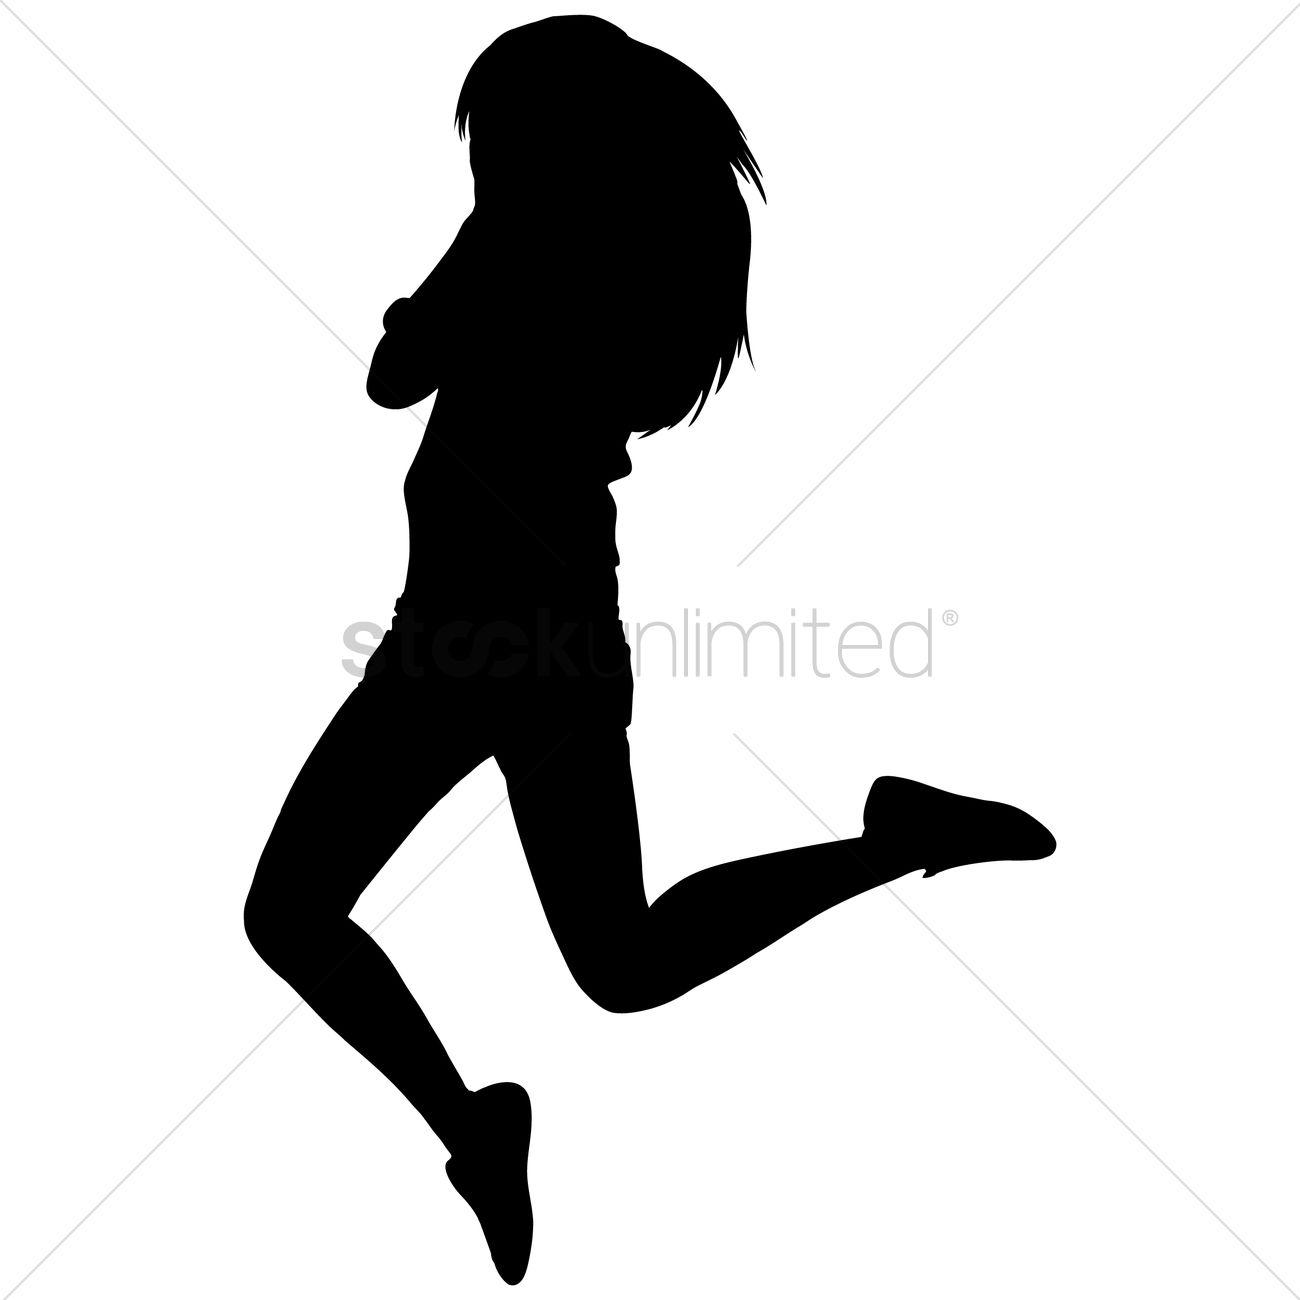 1300x1300 Free Silhouette Of A Joyful Woman Vector Image